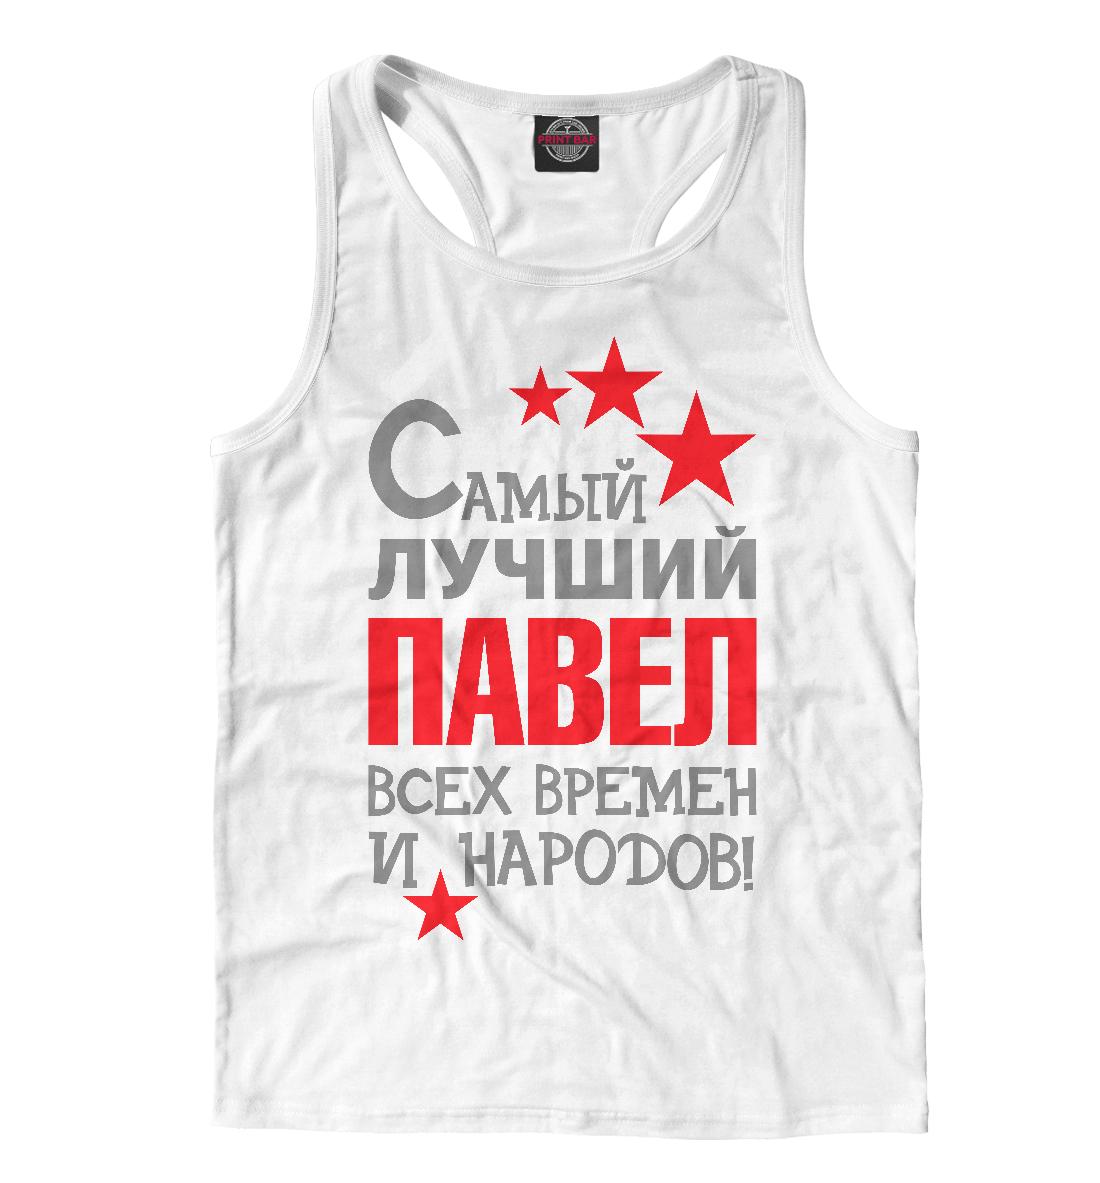 Купить Павел, Printbar, Майки борцовки, IMR-777245-mayb-2